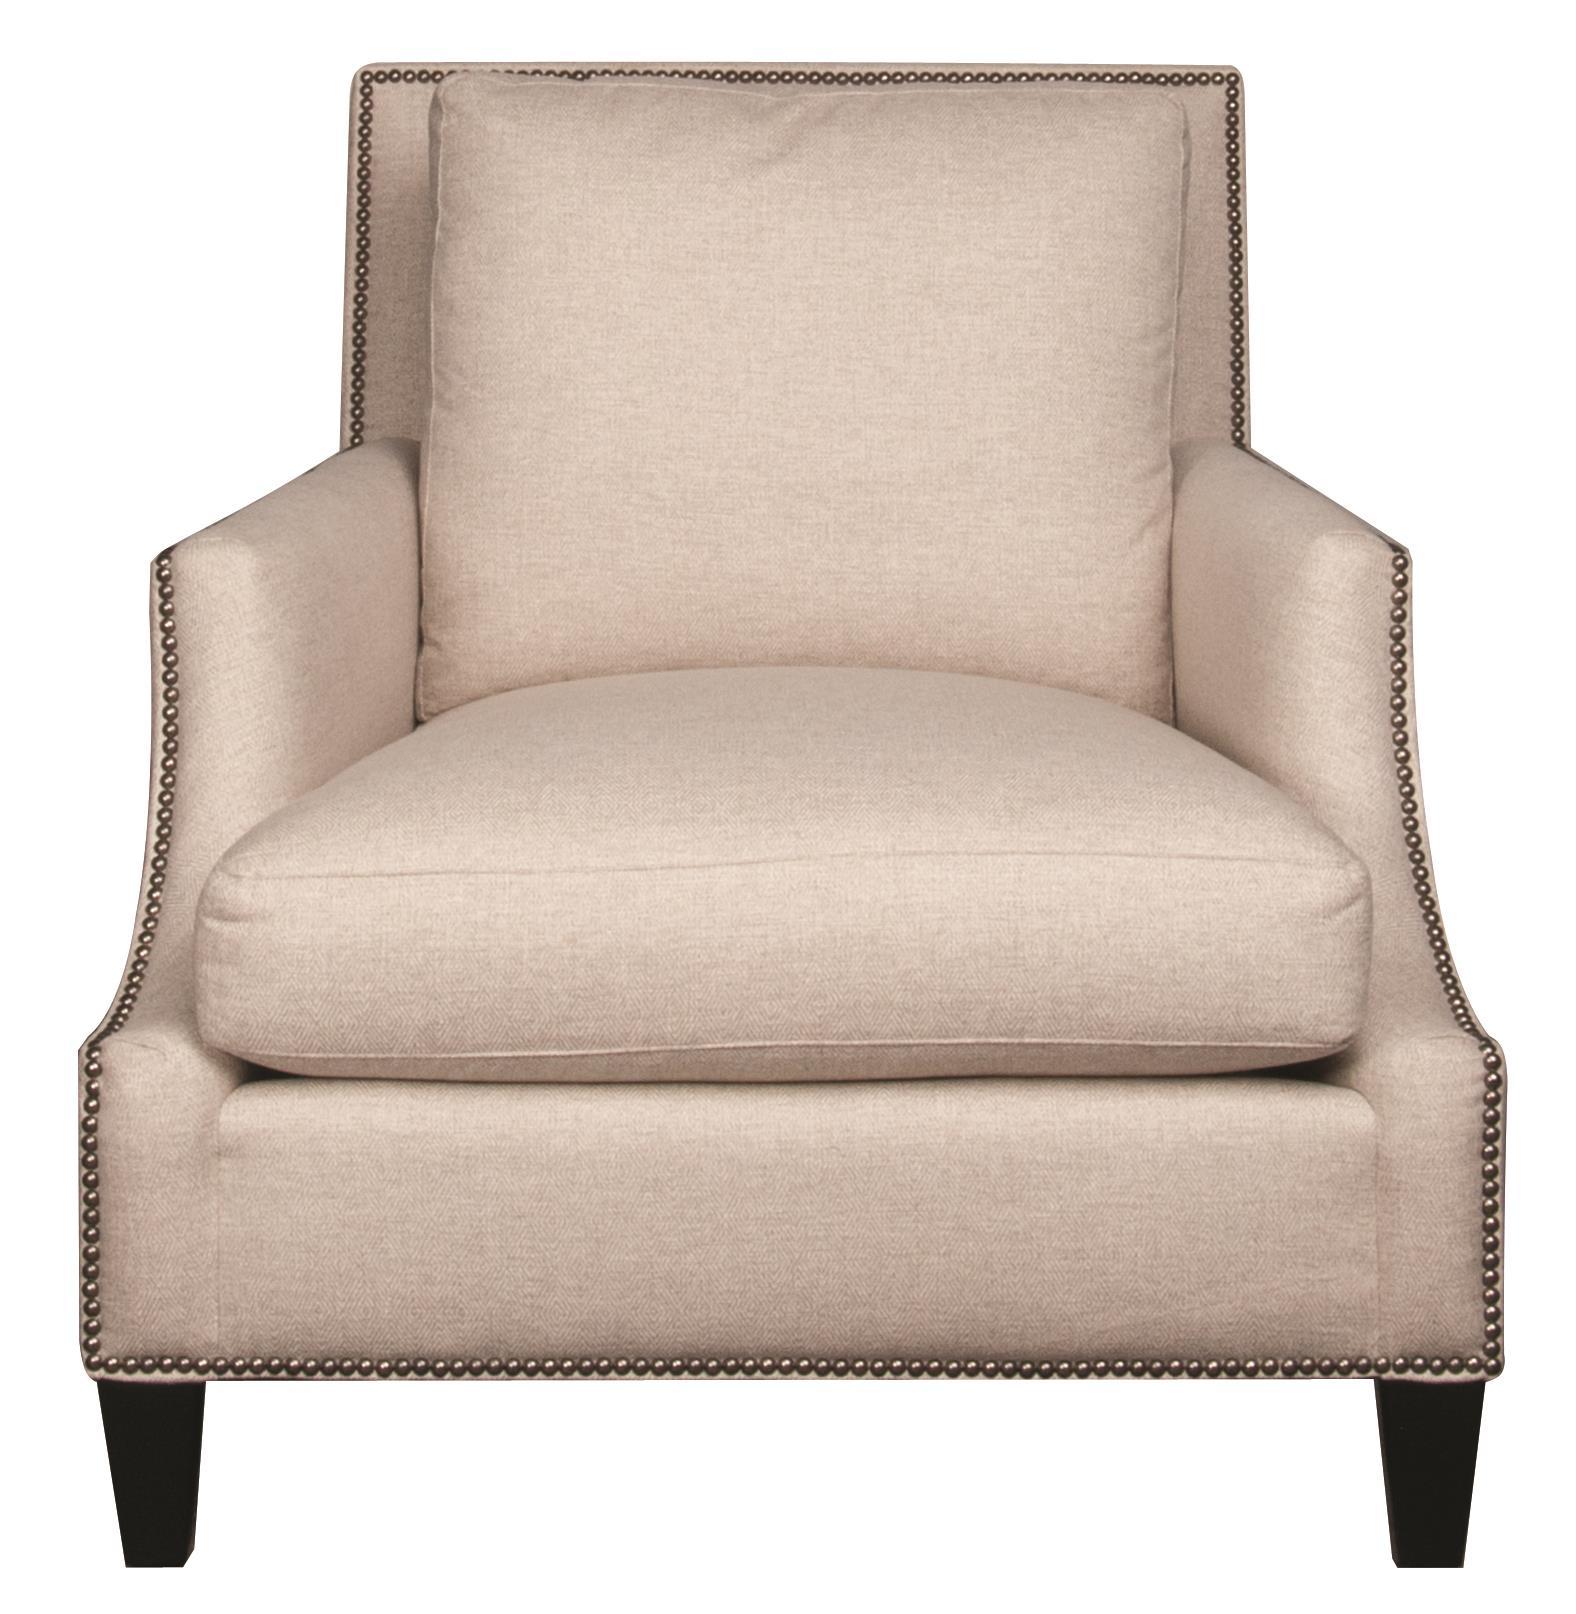 bernhardt sofa price list green chesterfield fabric crawford thesofa